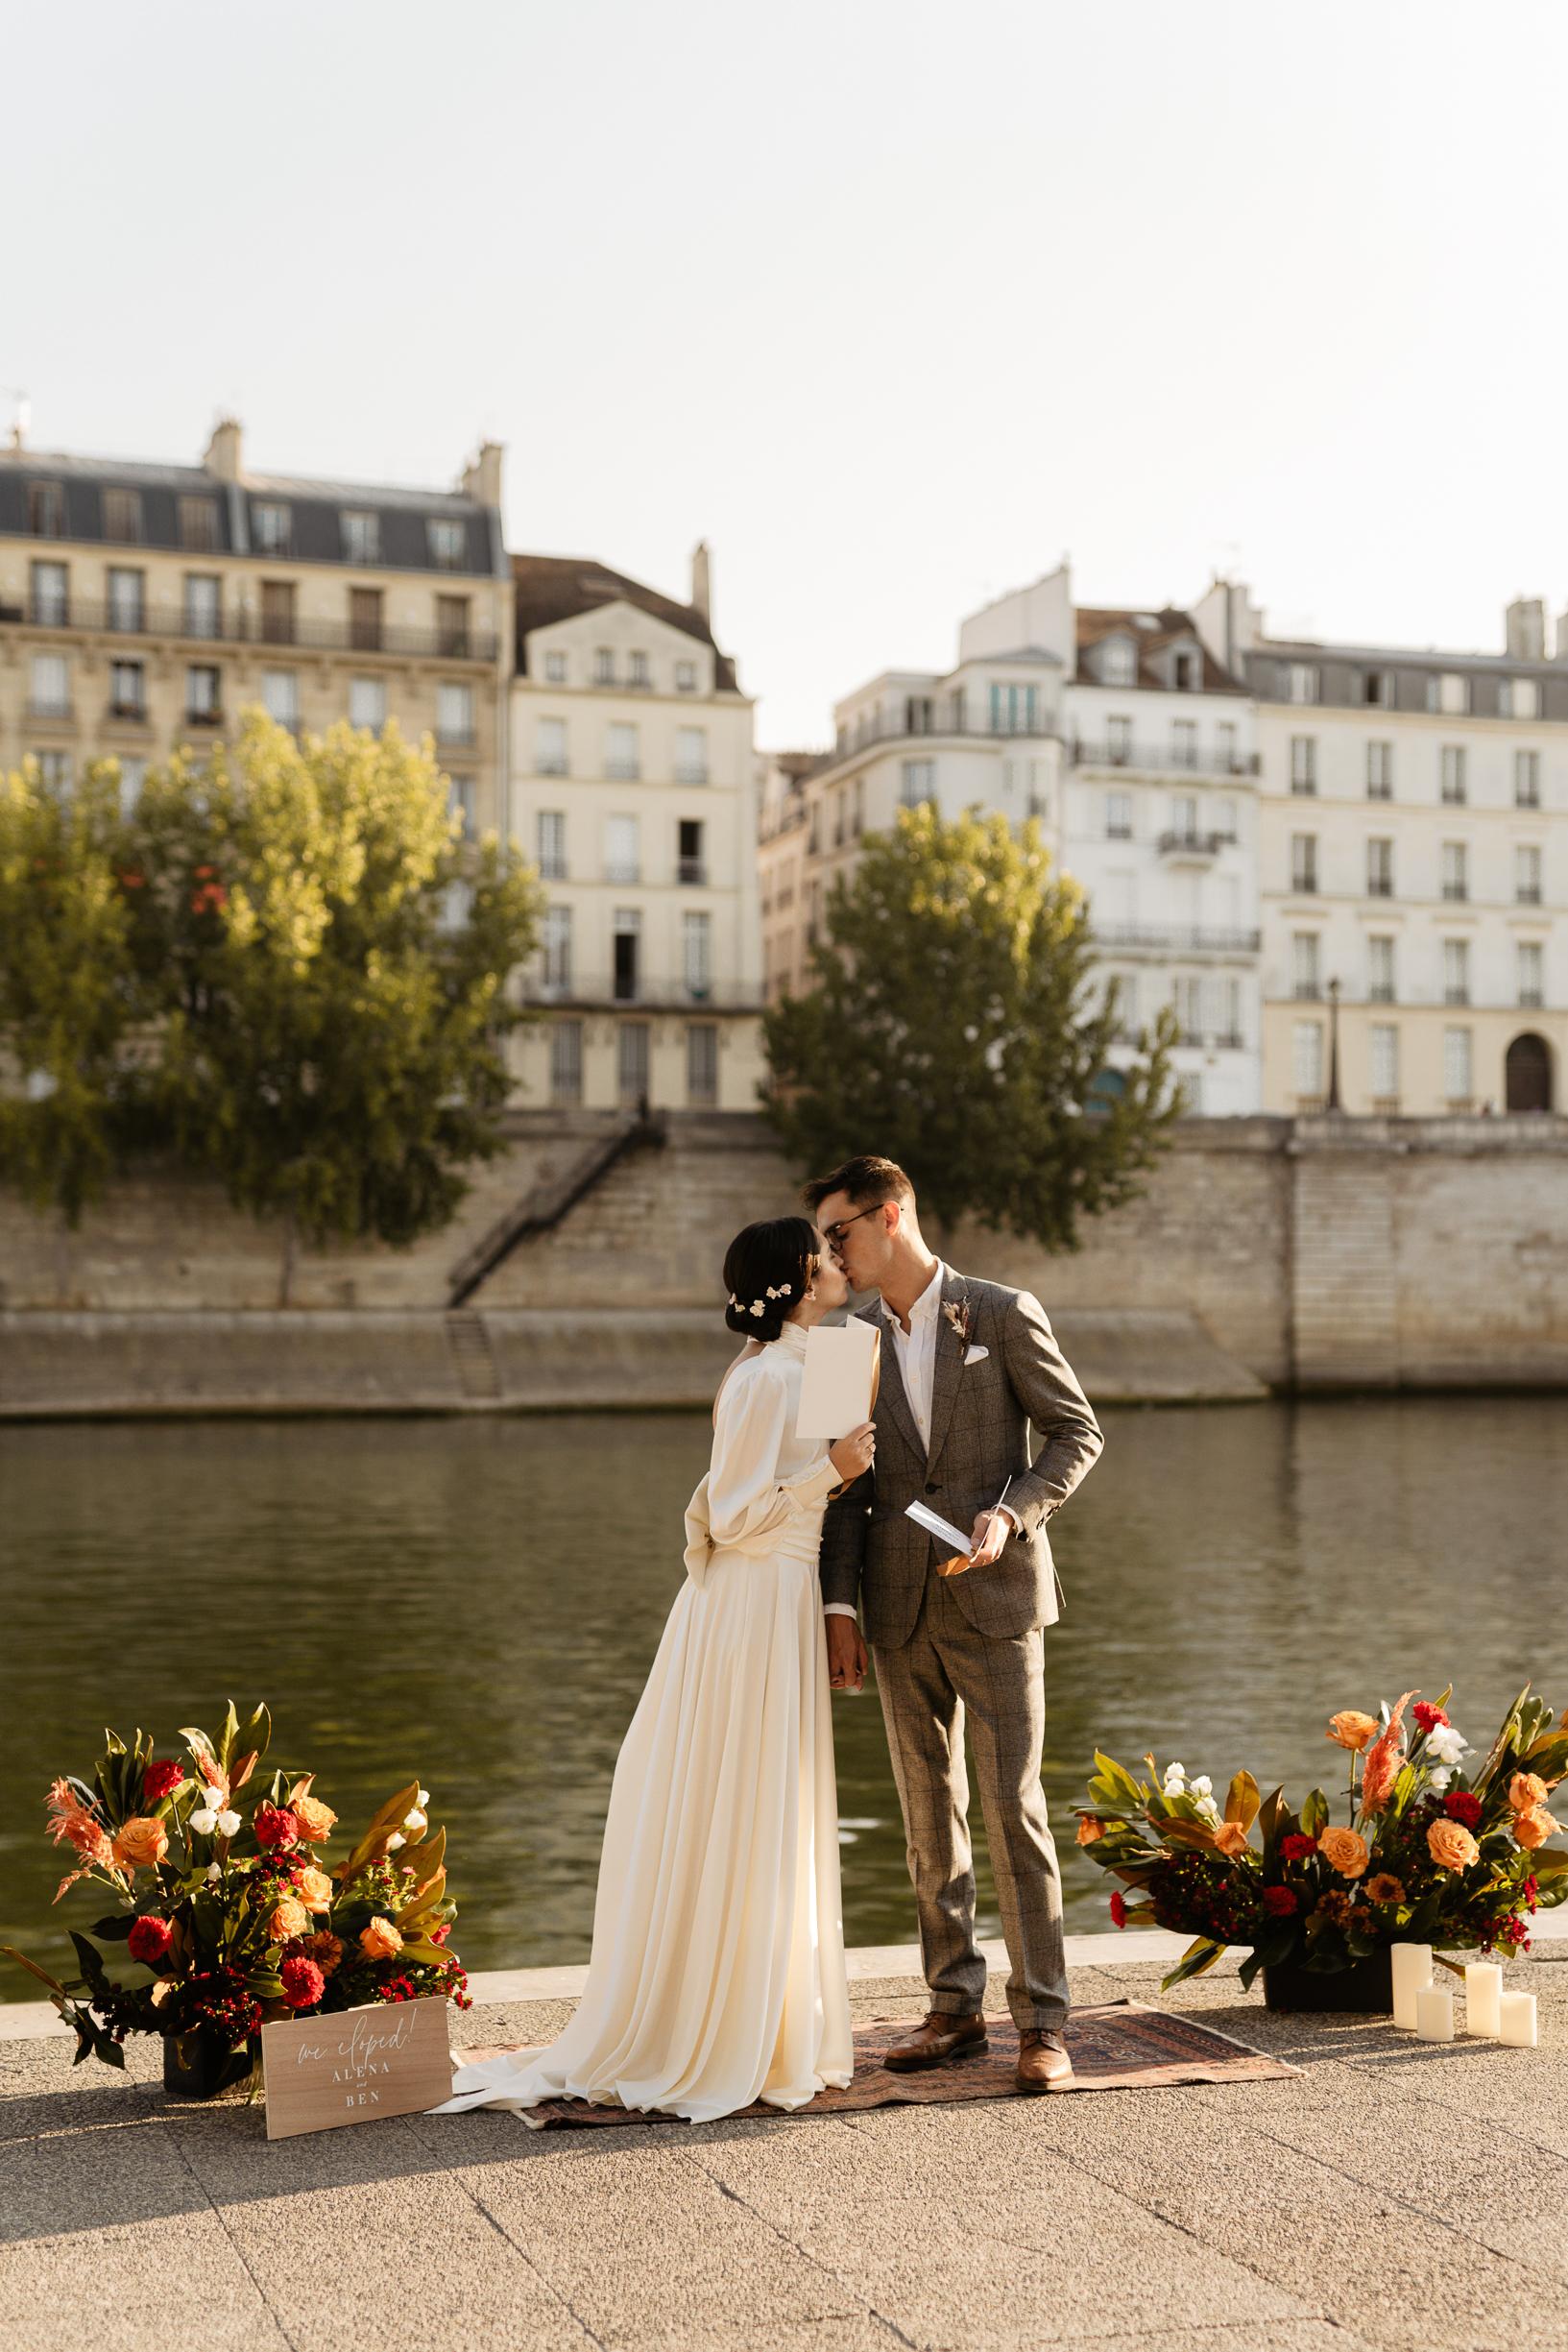 Paris Wedding & Elopement photographer couple photoshoot by the seine with flower bouquet